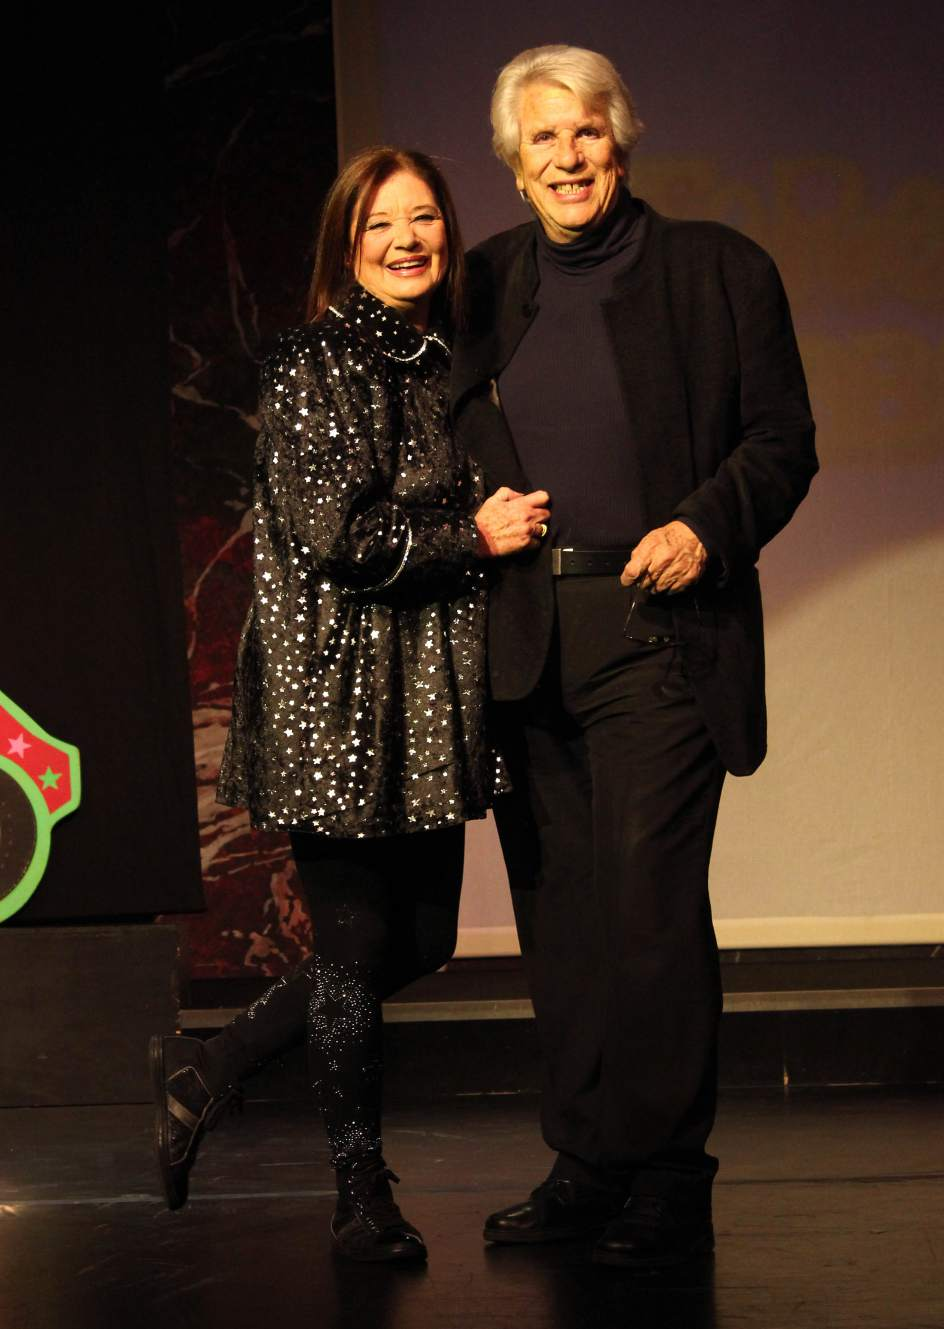 Muere Eduardo Rodrigo, marido de Teresa Rabal y autor de éxitos como 'Veo, Veo'